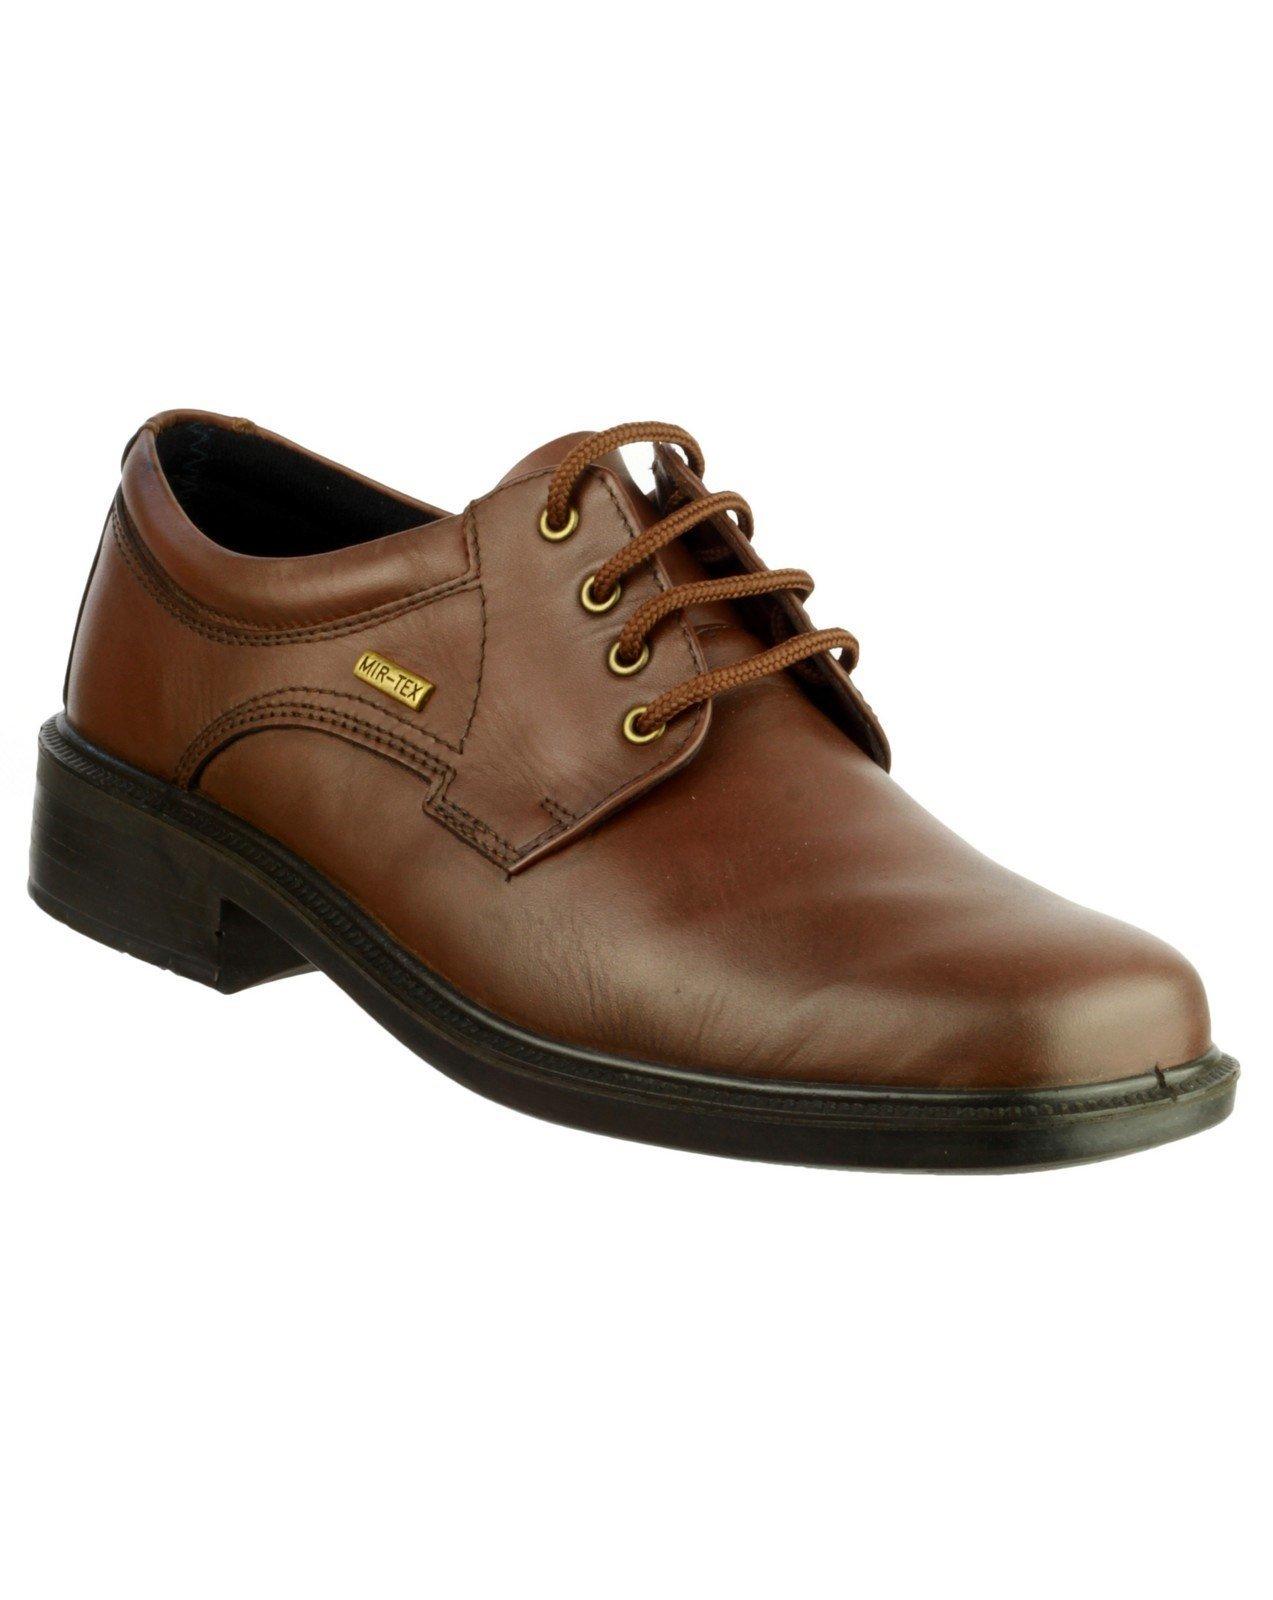 Cotswold Men's Sudeley Waterproof Shoe Various Colours 12718 - Brown 6